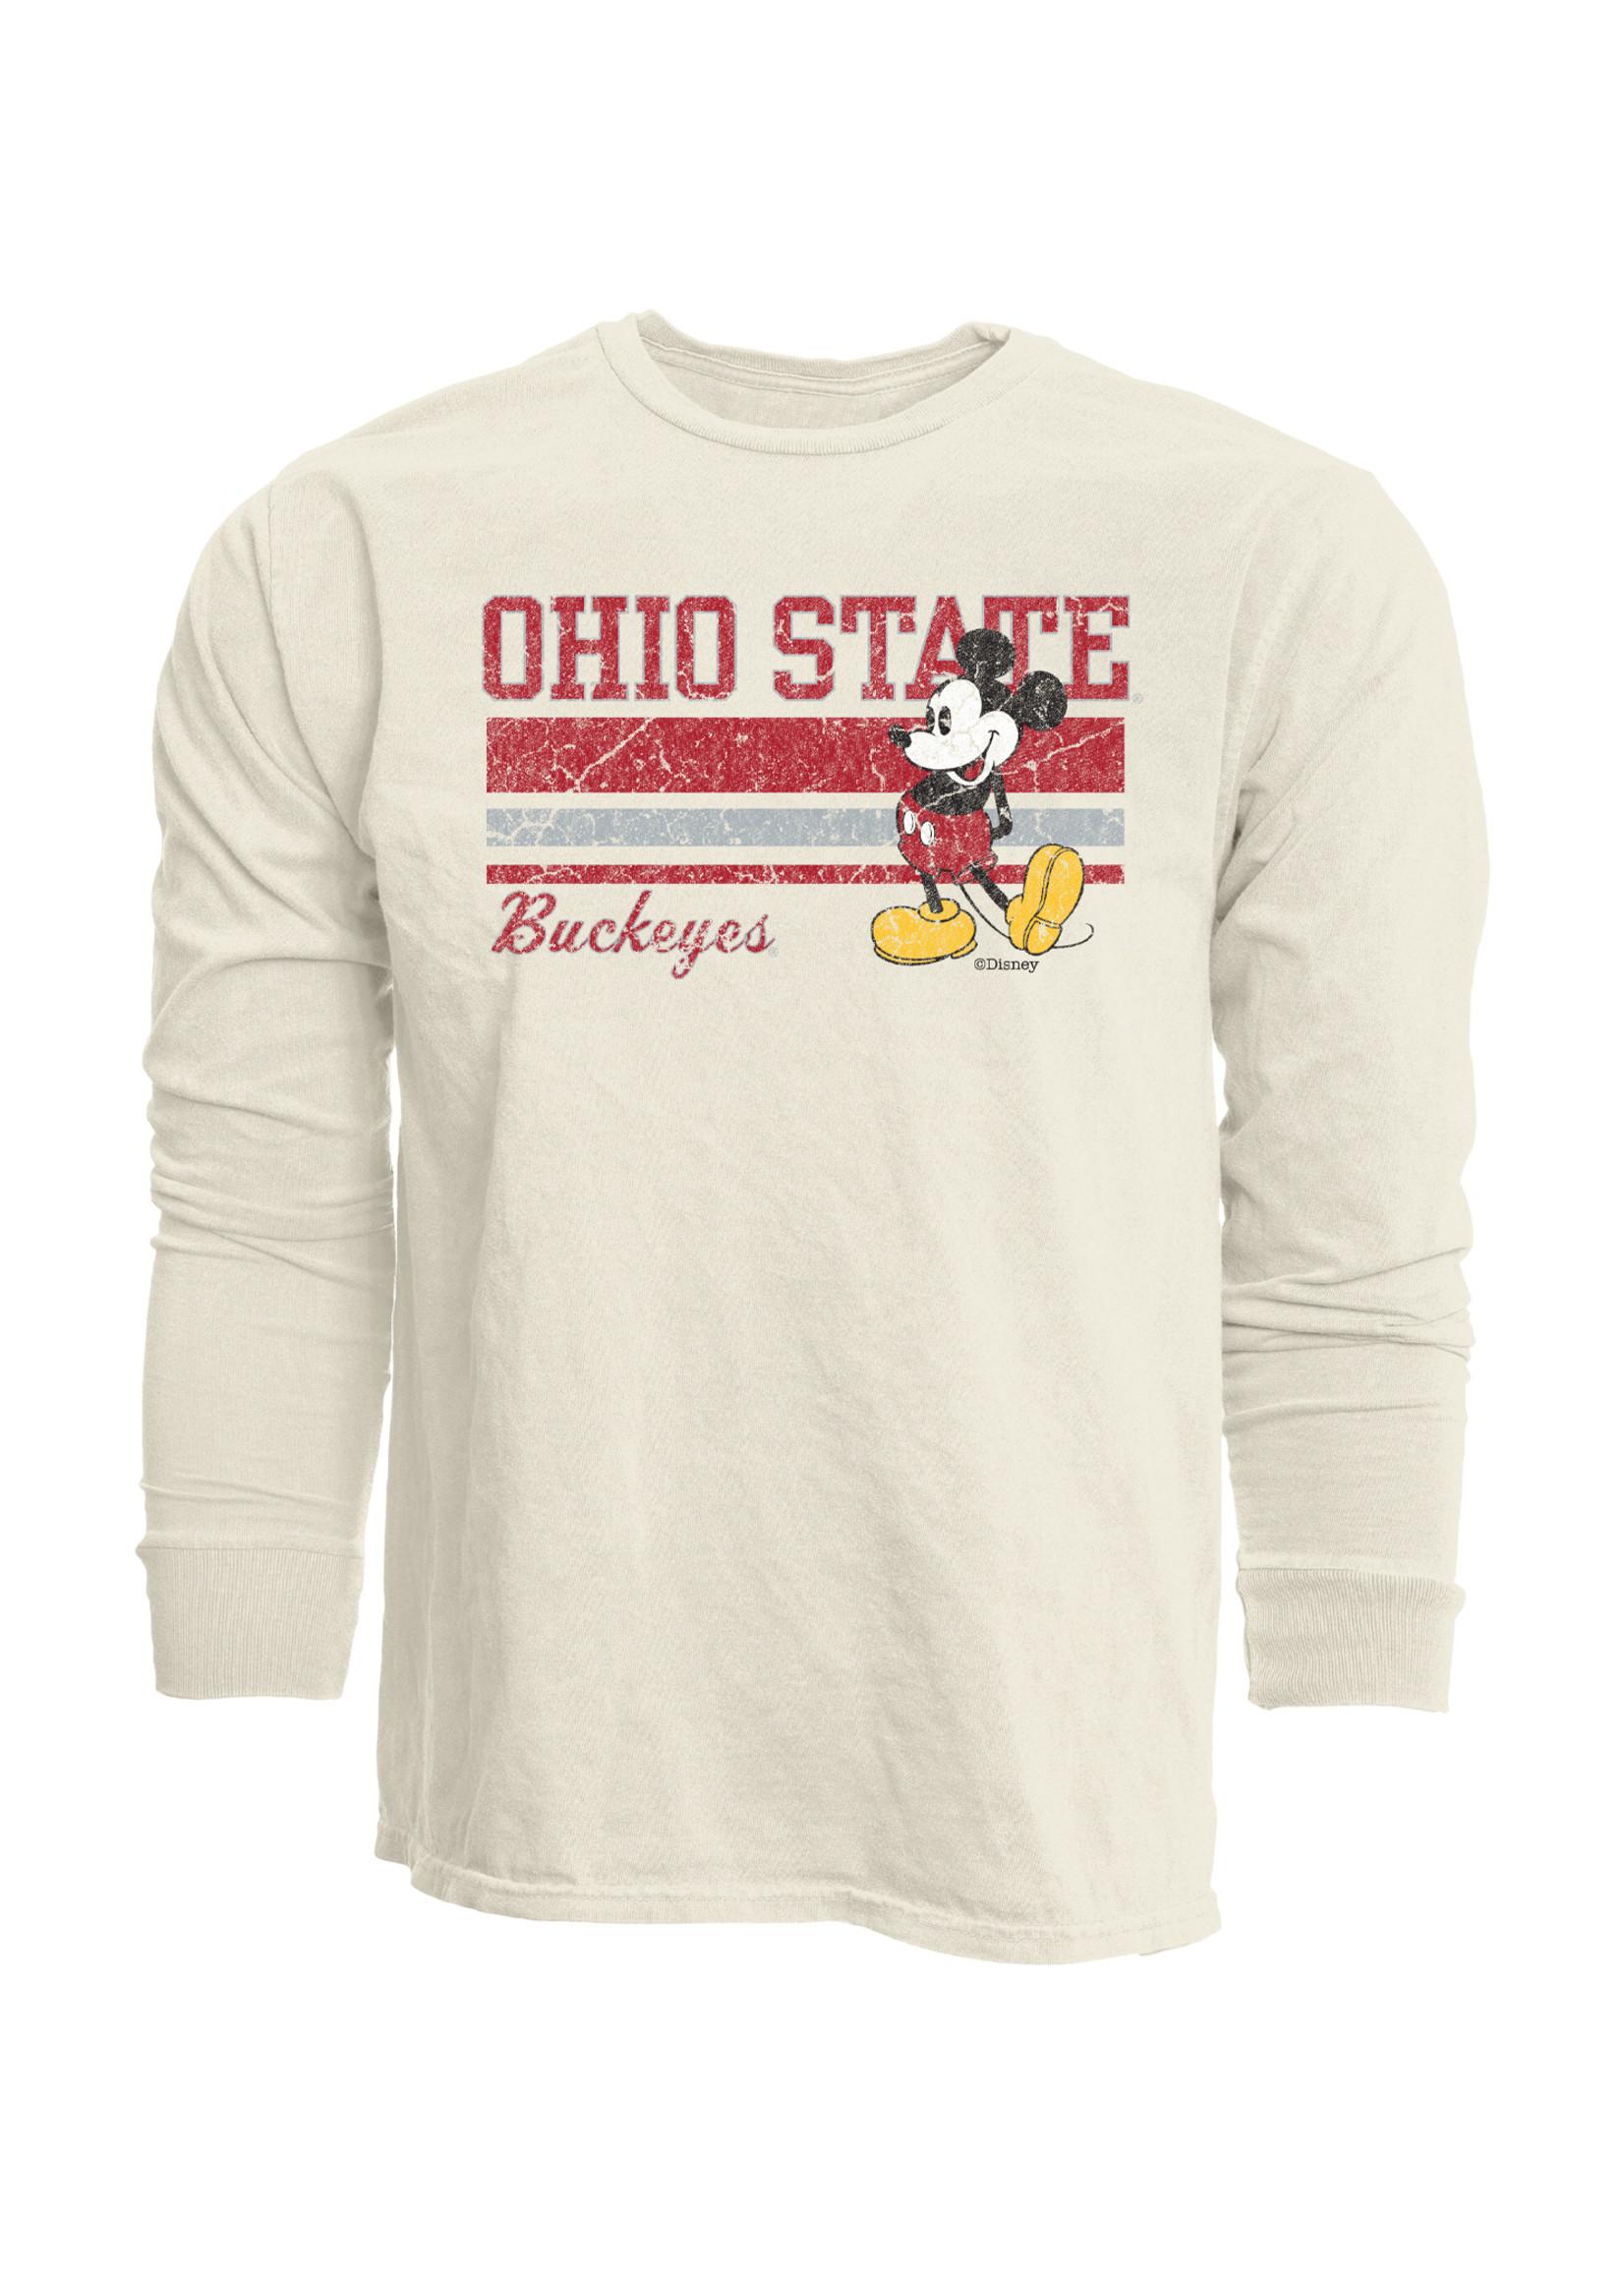 Ohio State Buckeyes Mickey Mouse Ivory Long Sleeve